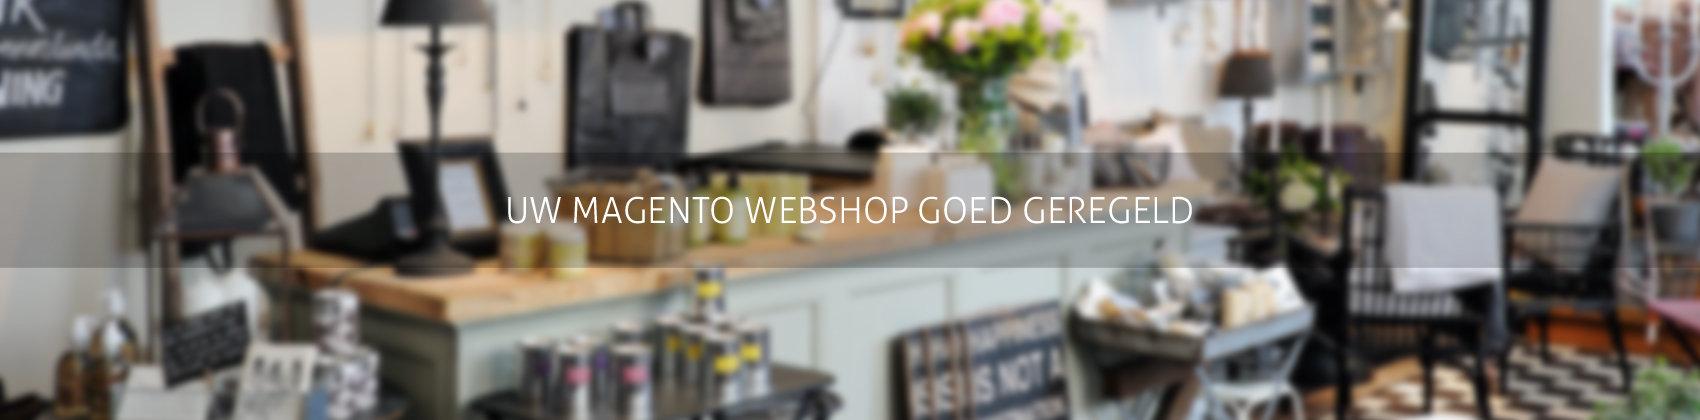 Responsive magento webshop